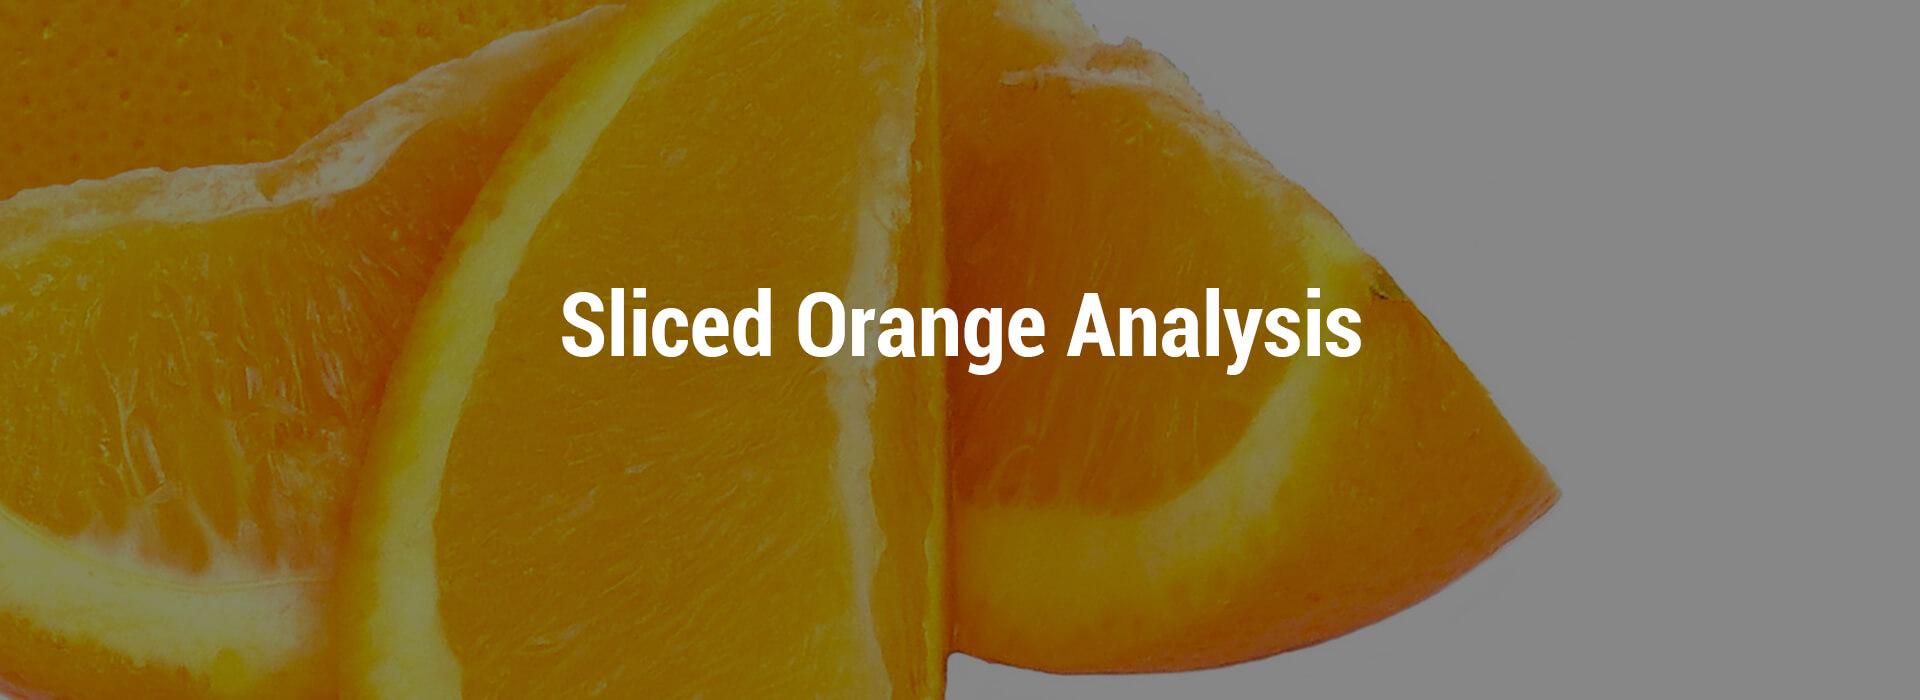 LVHS-sliced-orange-header